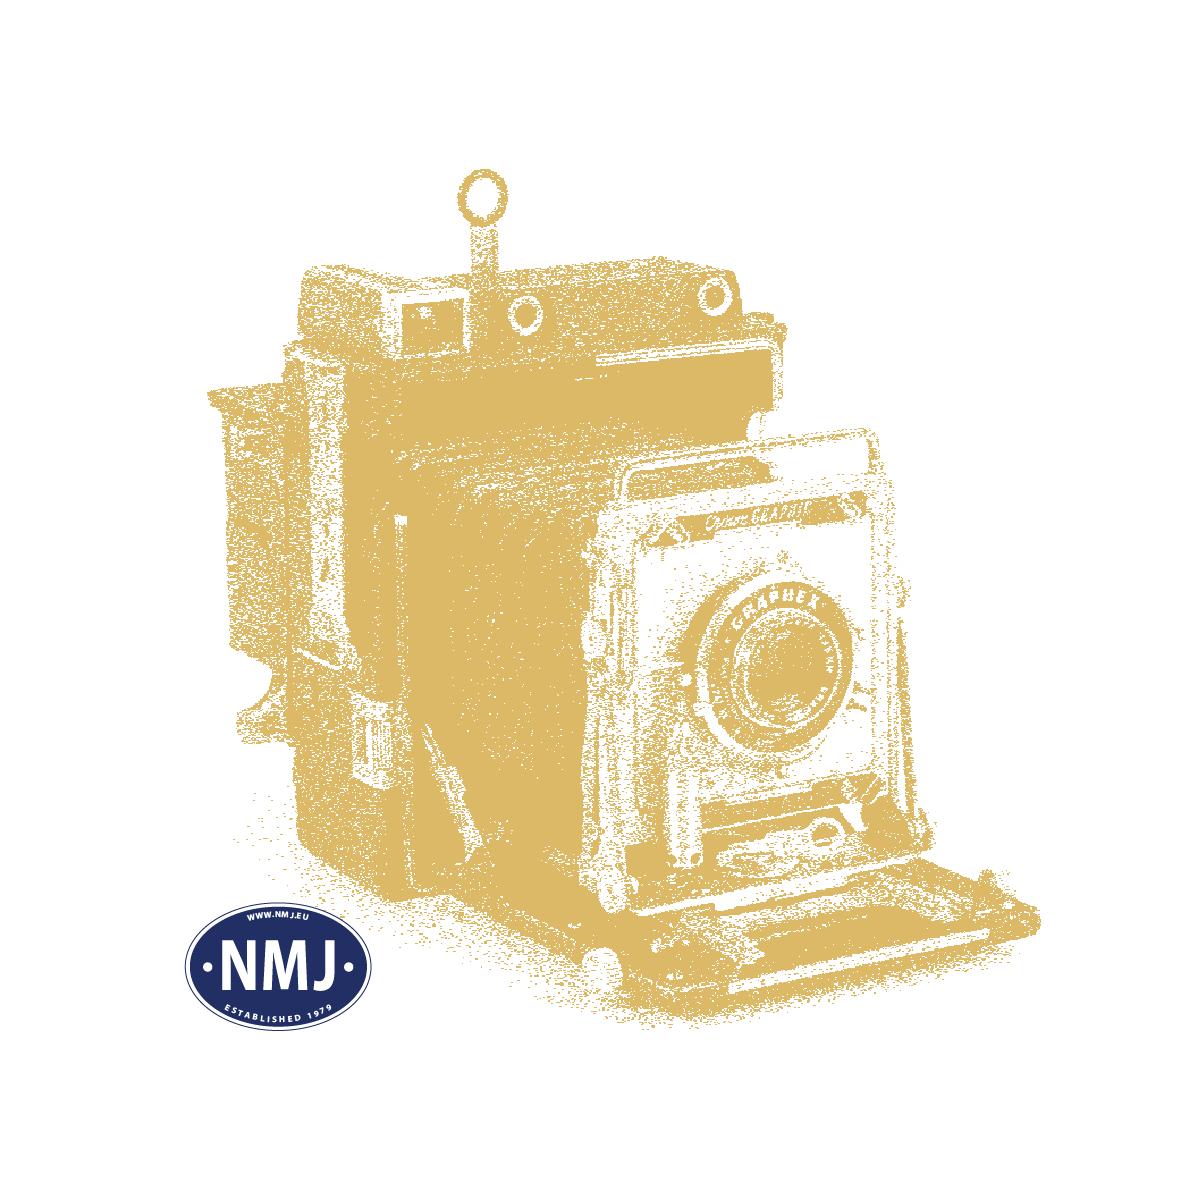 NOC15850 - Badende